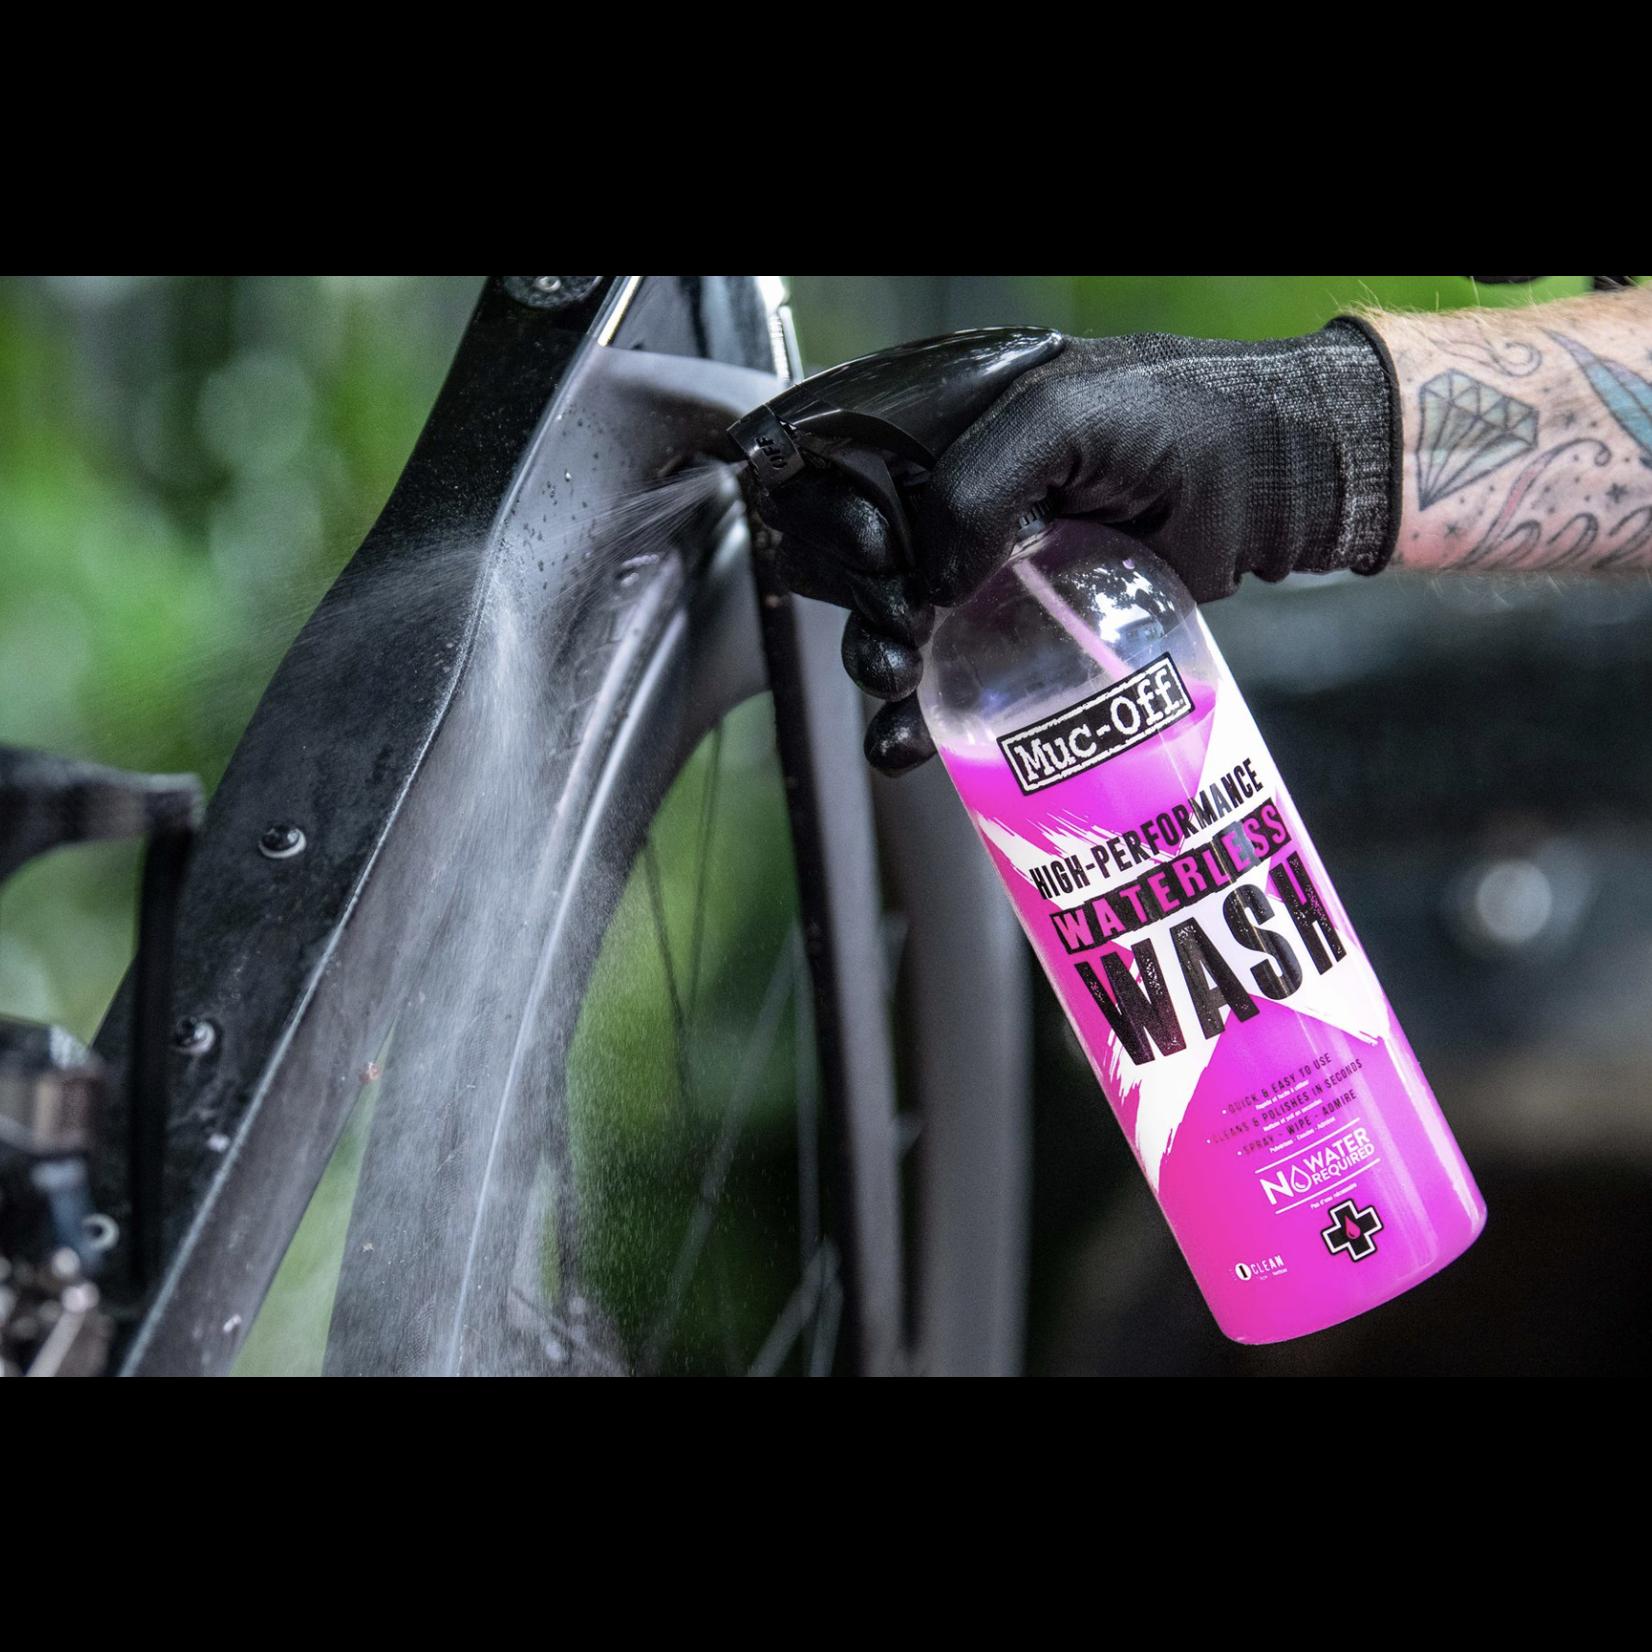 muc-off Muc-Off High Performance Waterless Wash 750ml